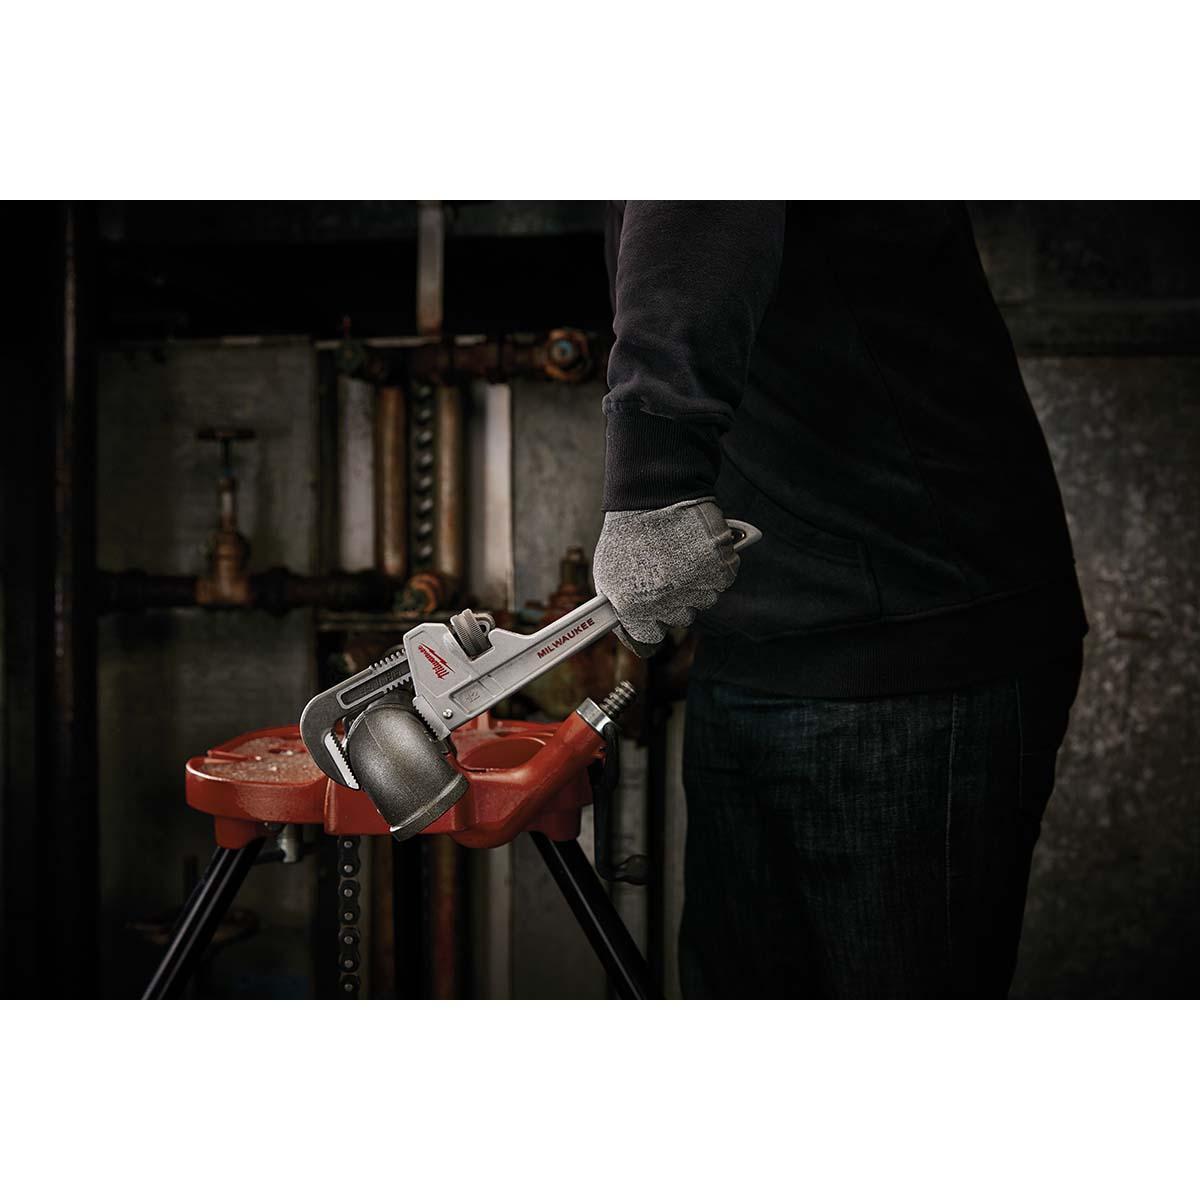 12 Aluminum Pipe Wrench